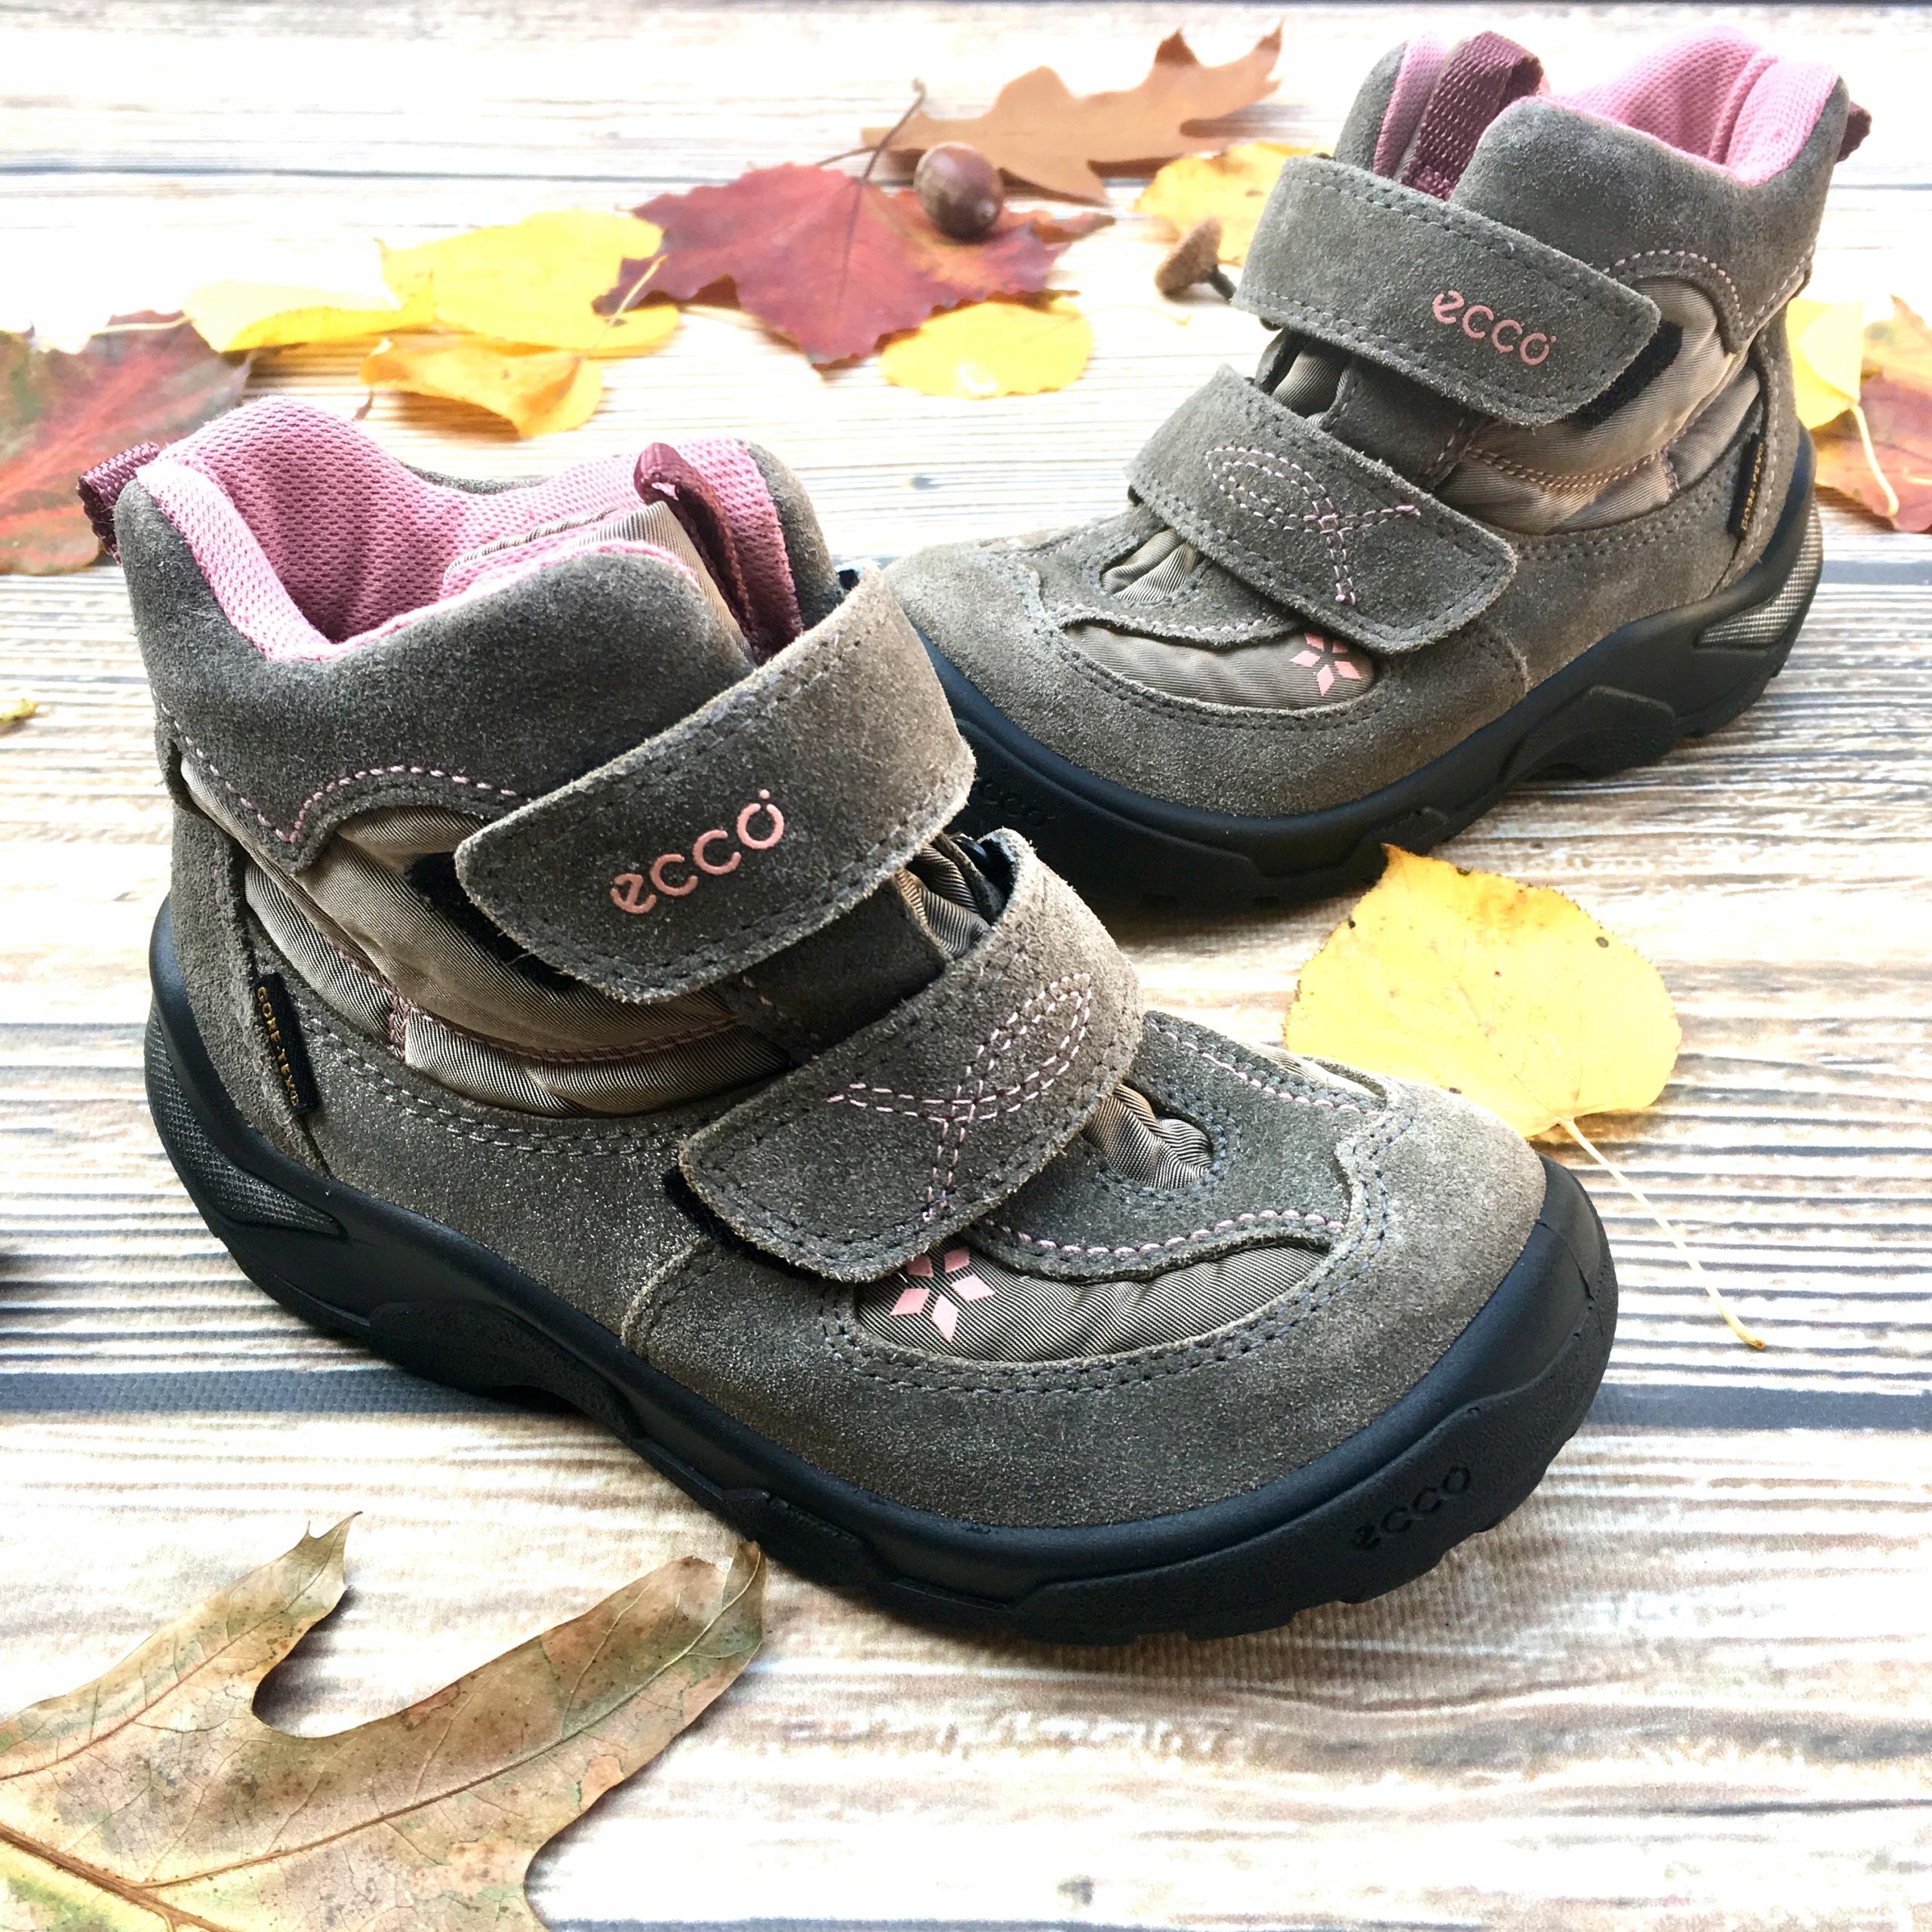 636e2ee2 Ecco buty zimowe śniegowce kozaki Gore-Tex 28 - 7675523192 ...